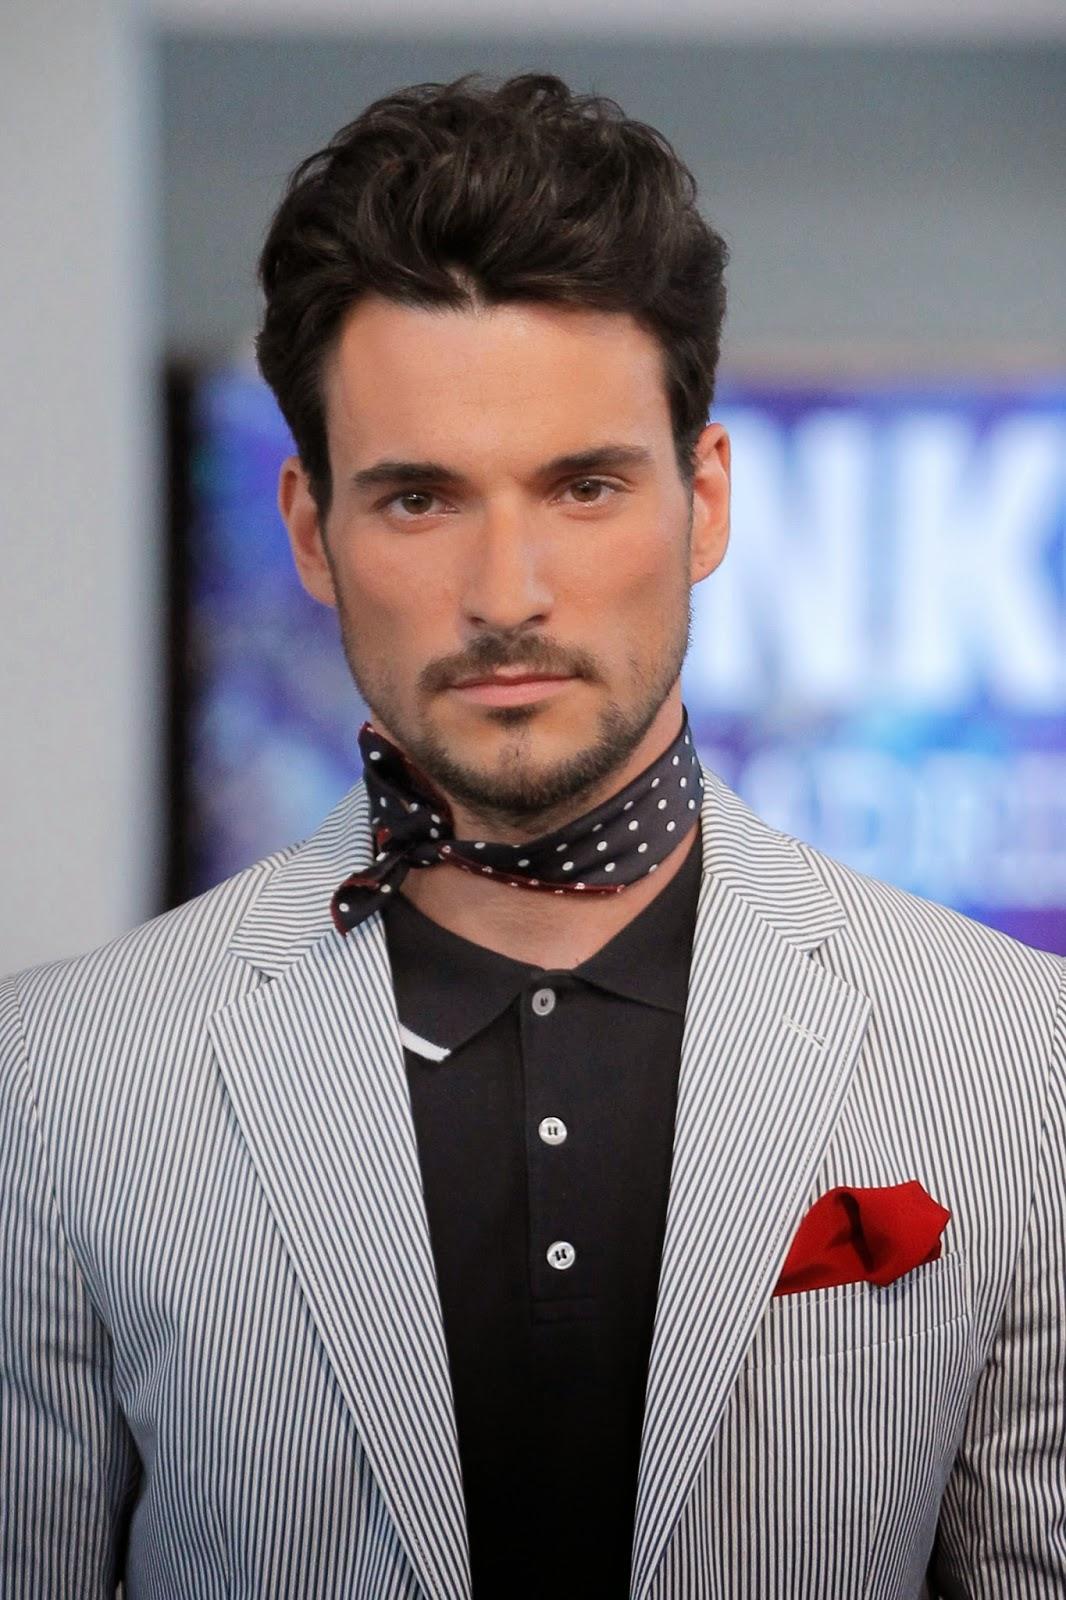 Colección, Primavera Verano 2015, Tenkey, moda masculina, street style, fashion, lifestyle, men, MFShow Mem,